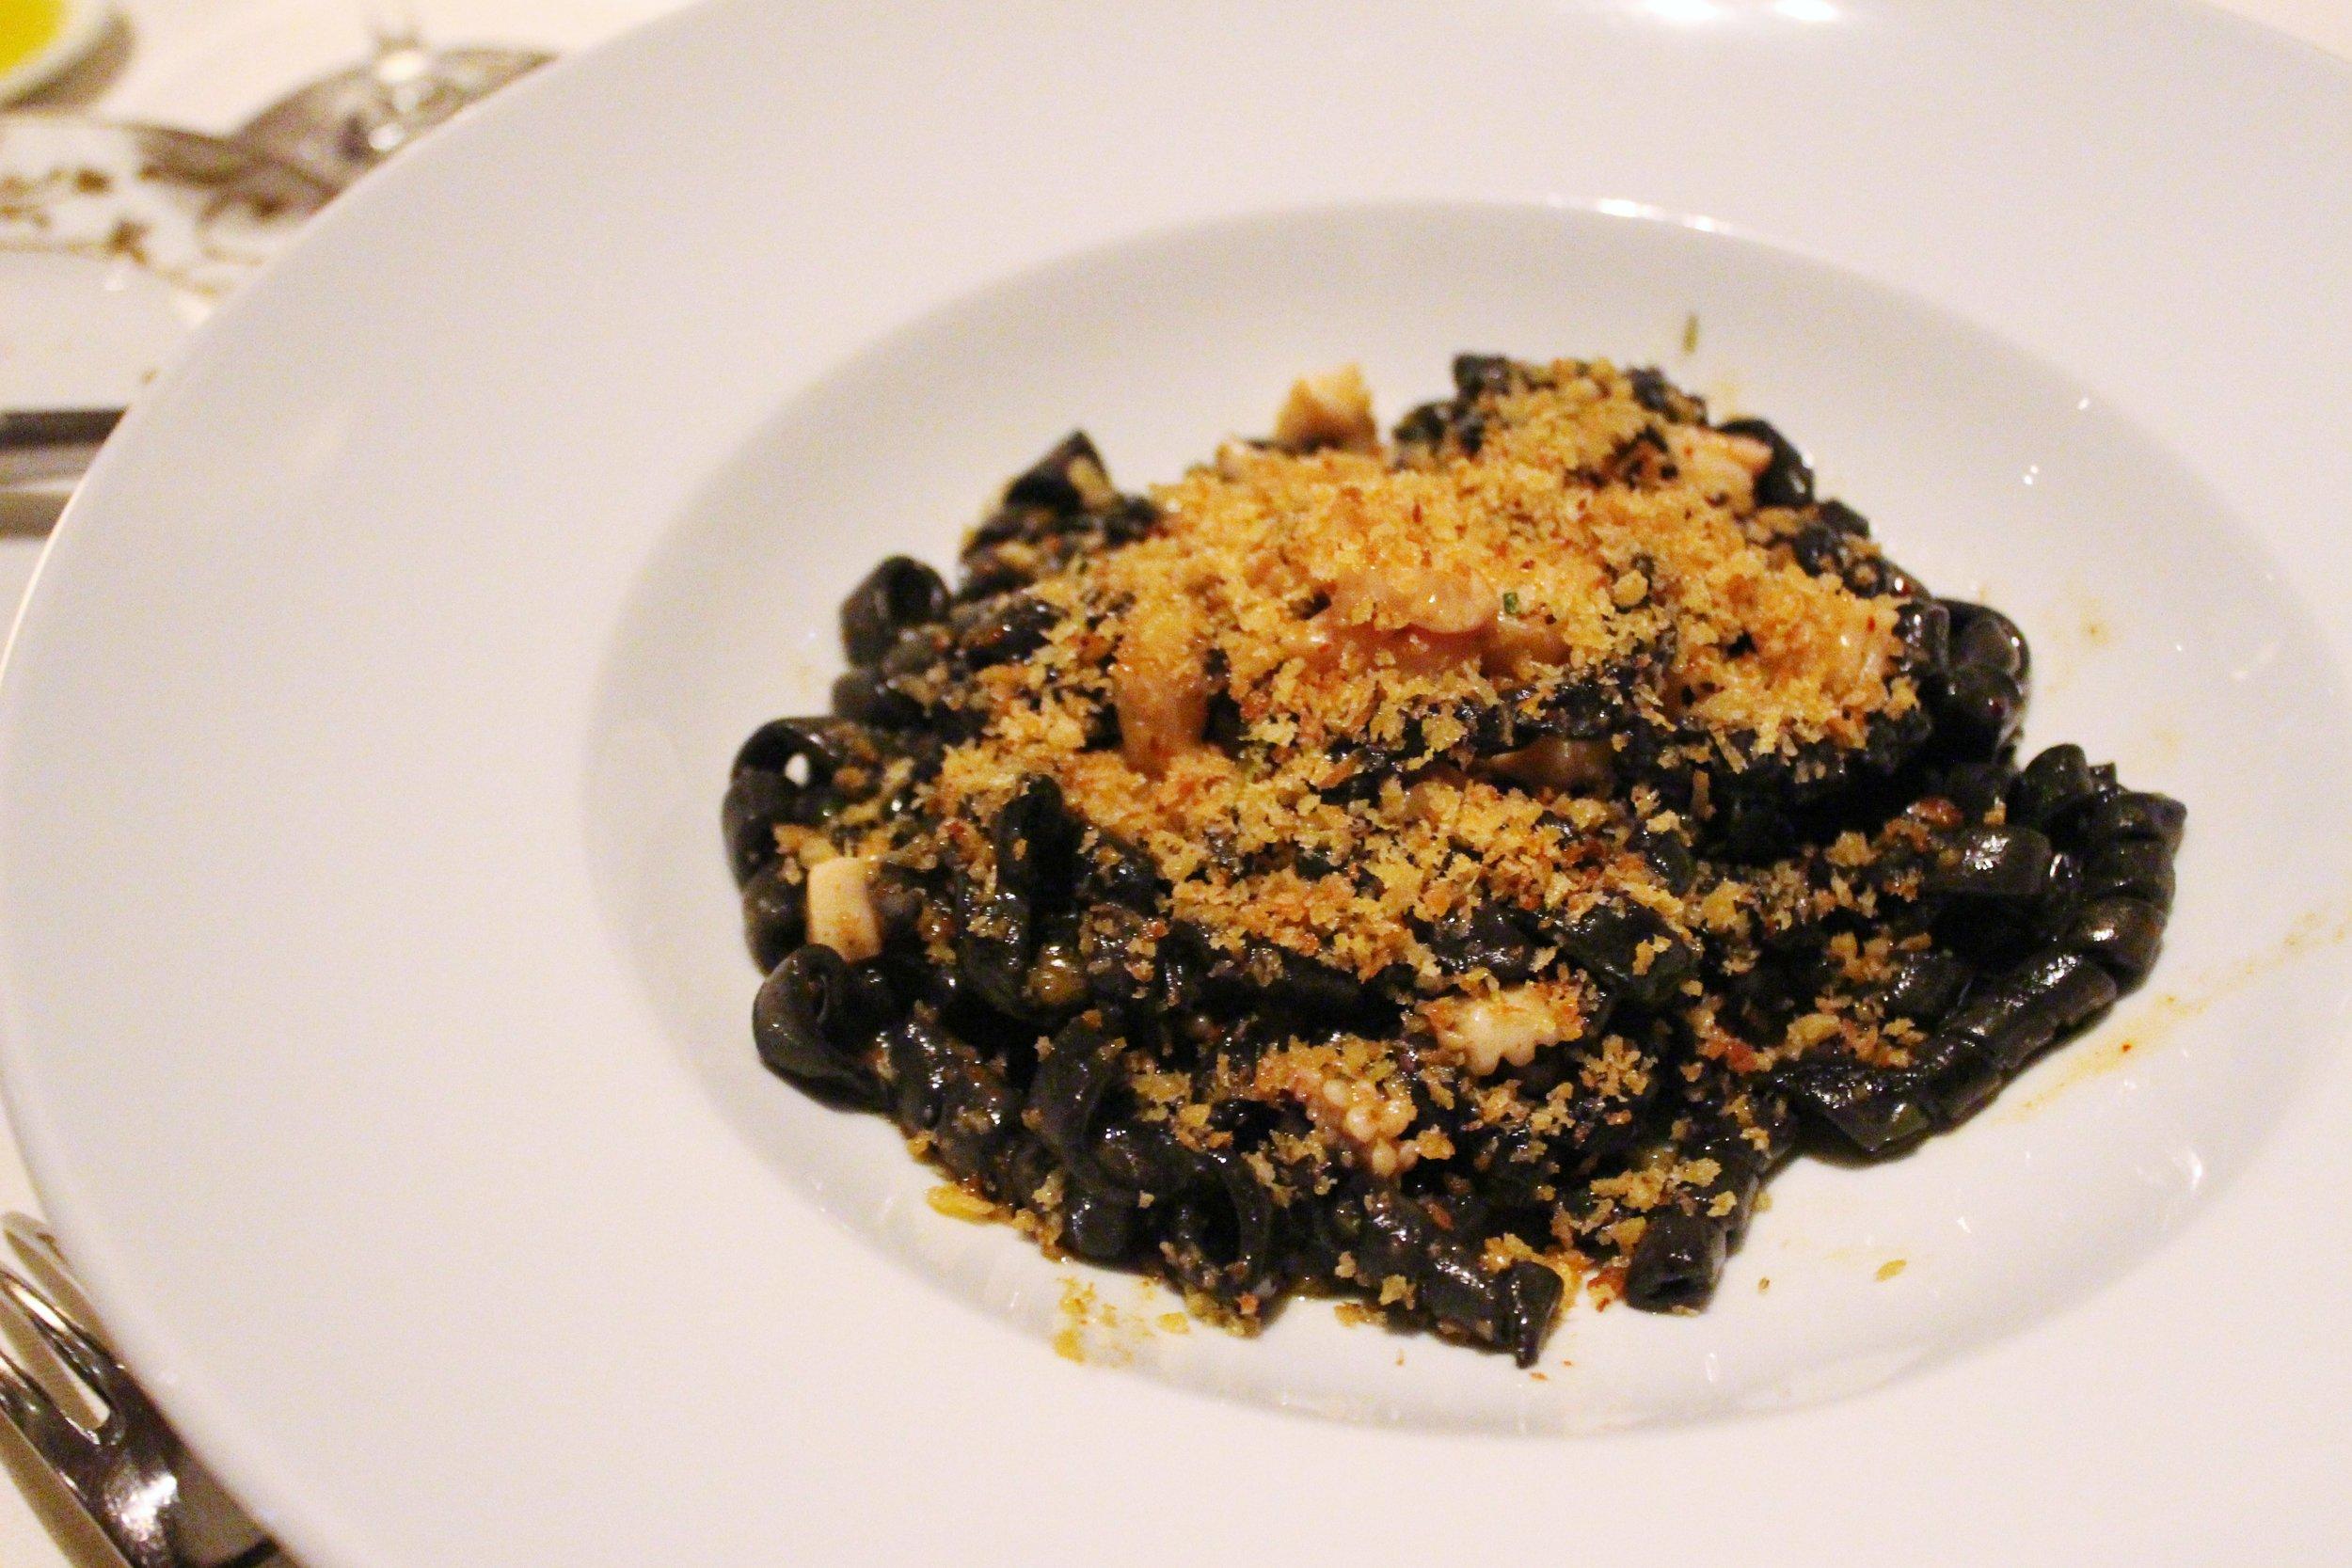 Trofie Nero: ligurian crustacean ragu, seppia, scallops, spiced mollica